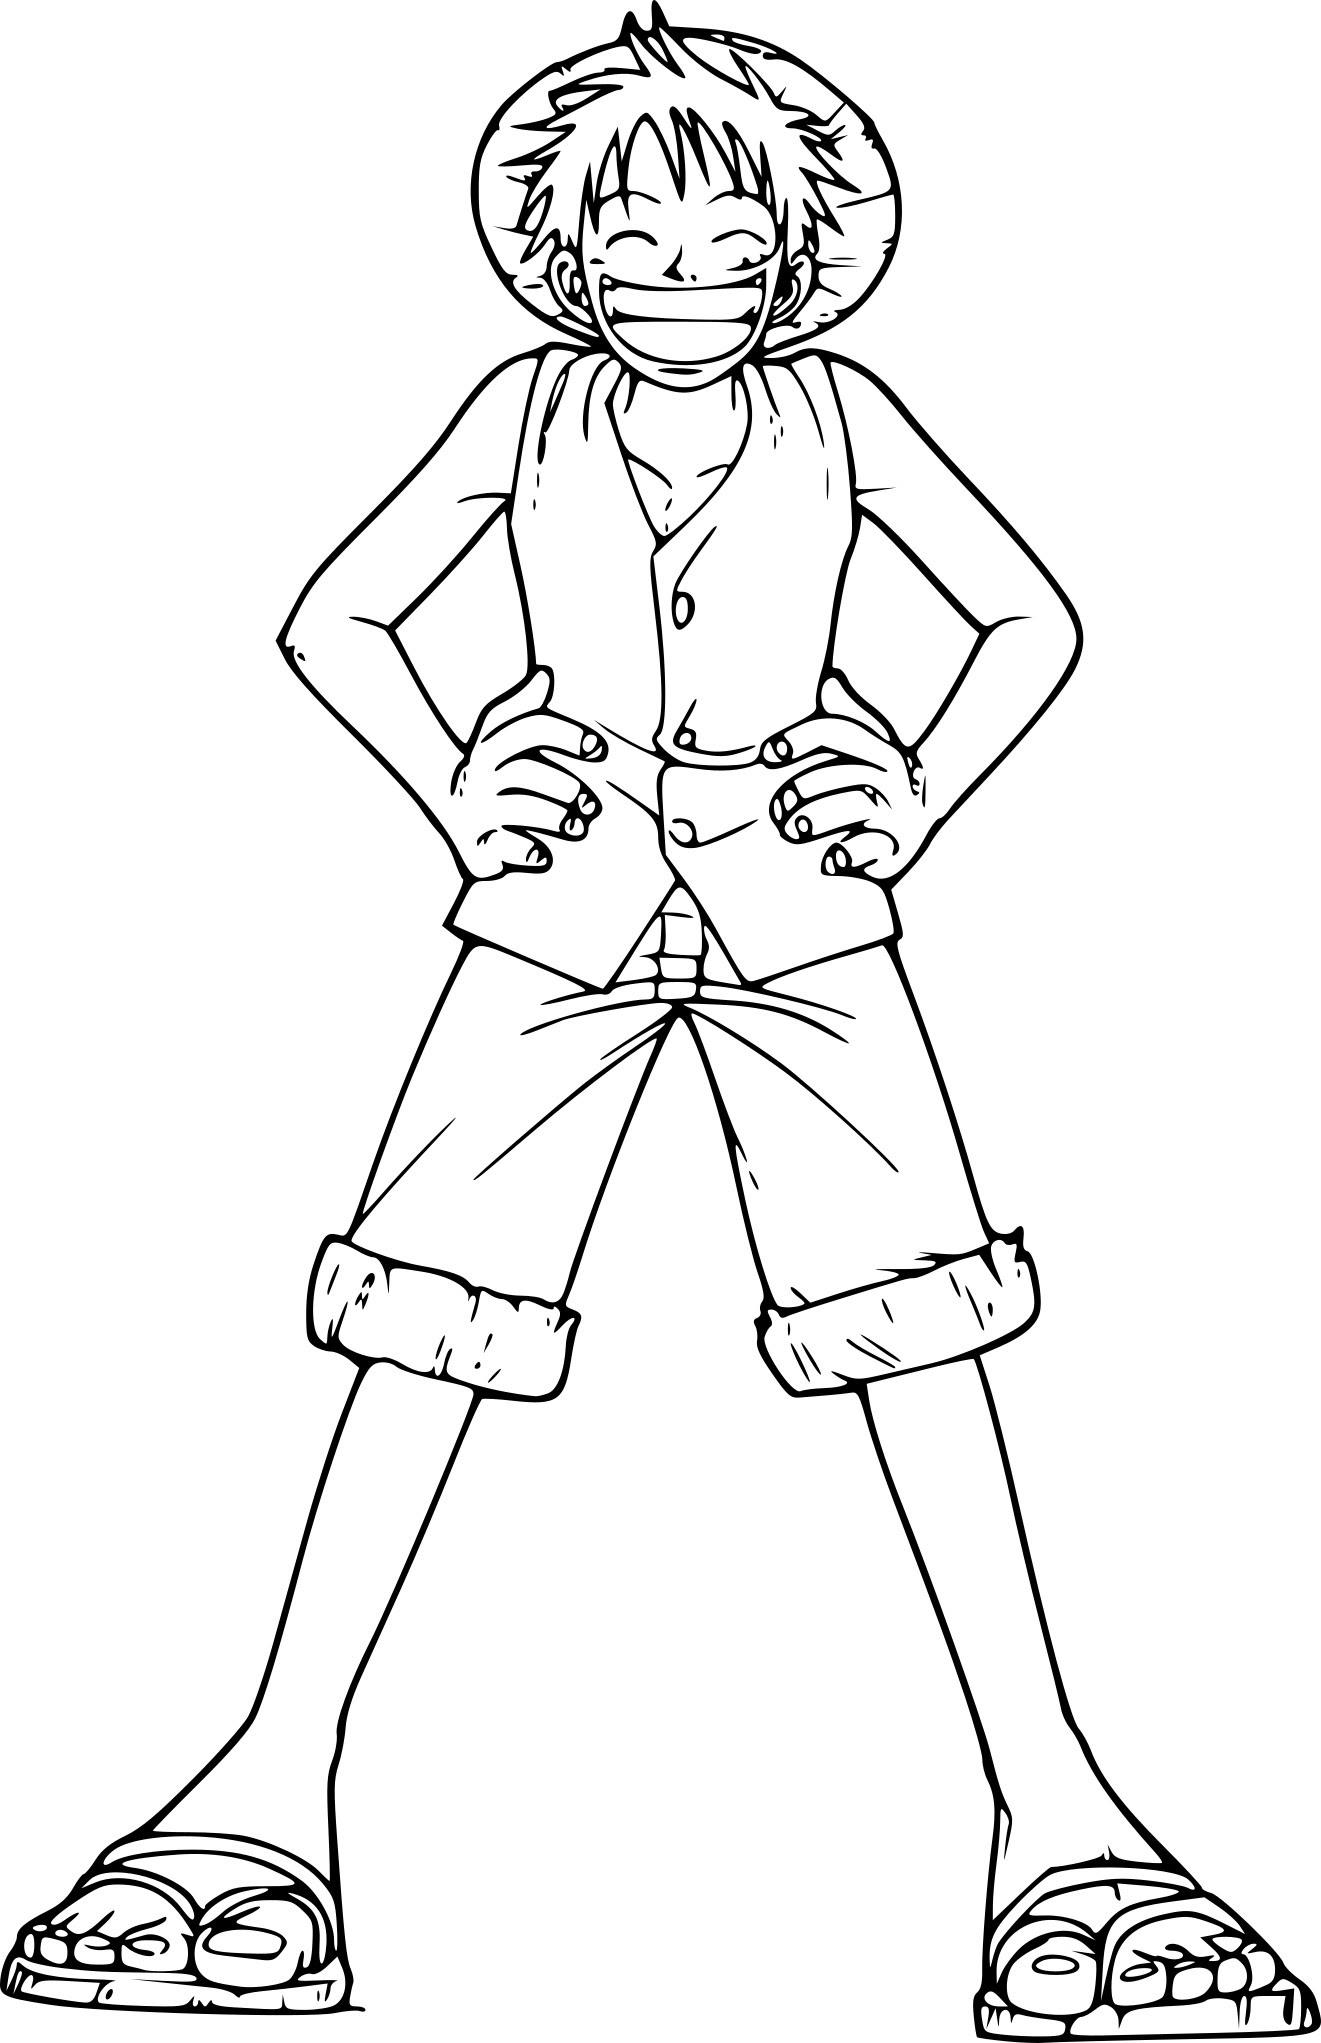 Coloriage de Luffy e Piece